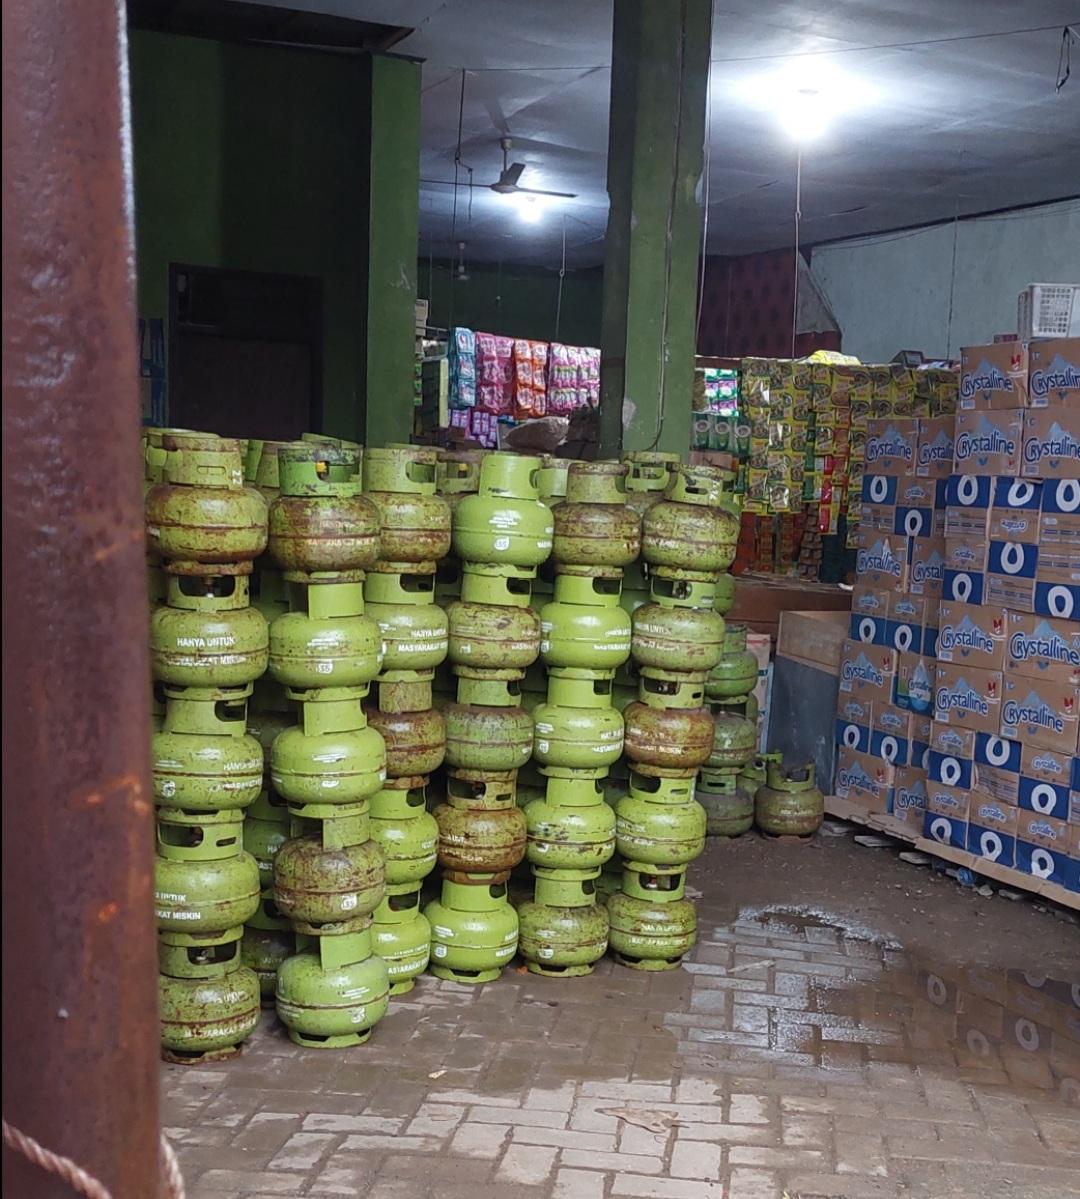 Gambar Wah! Diduga Penjual Elpiji Subsidi Ke Pengecer Warga Ciseureheun Itu Pemilik Pangkalan Desa Kubang Kampil 11